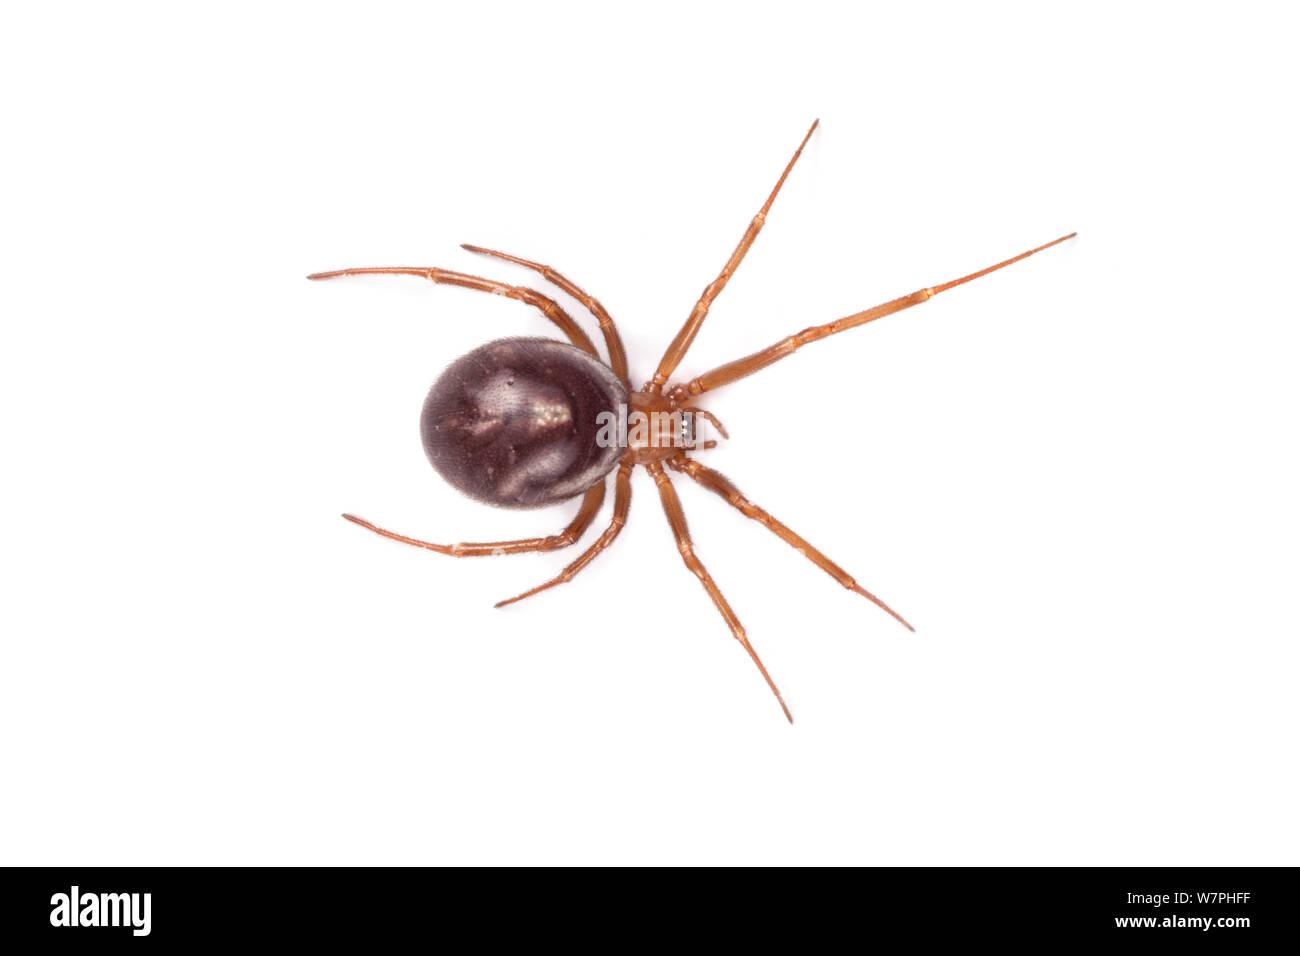 False Black Widow Steatoda Nobilis Female An Invasive Species To The Uk Stock Photo Alamy